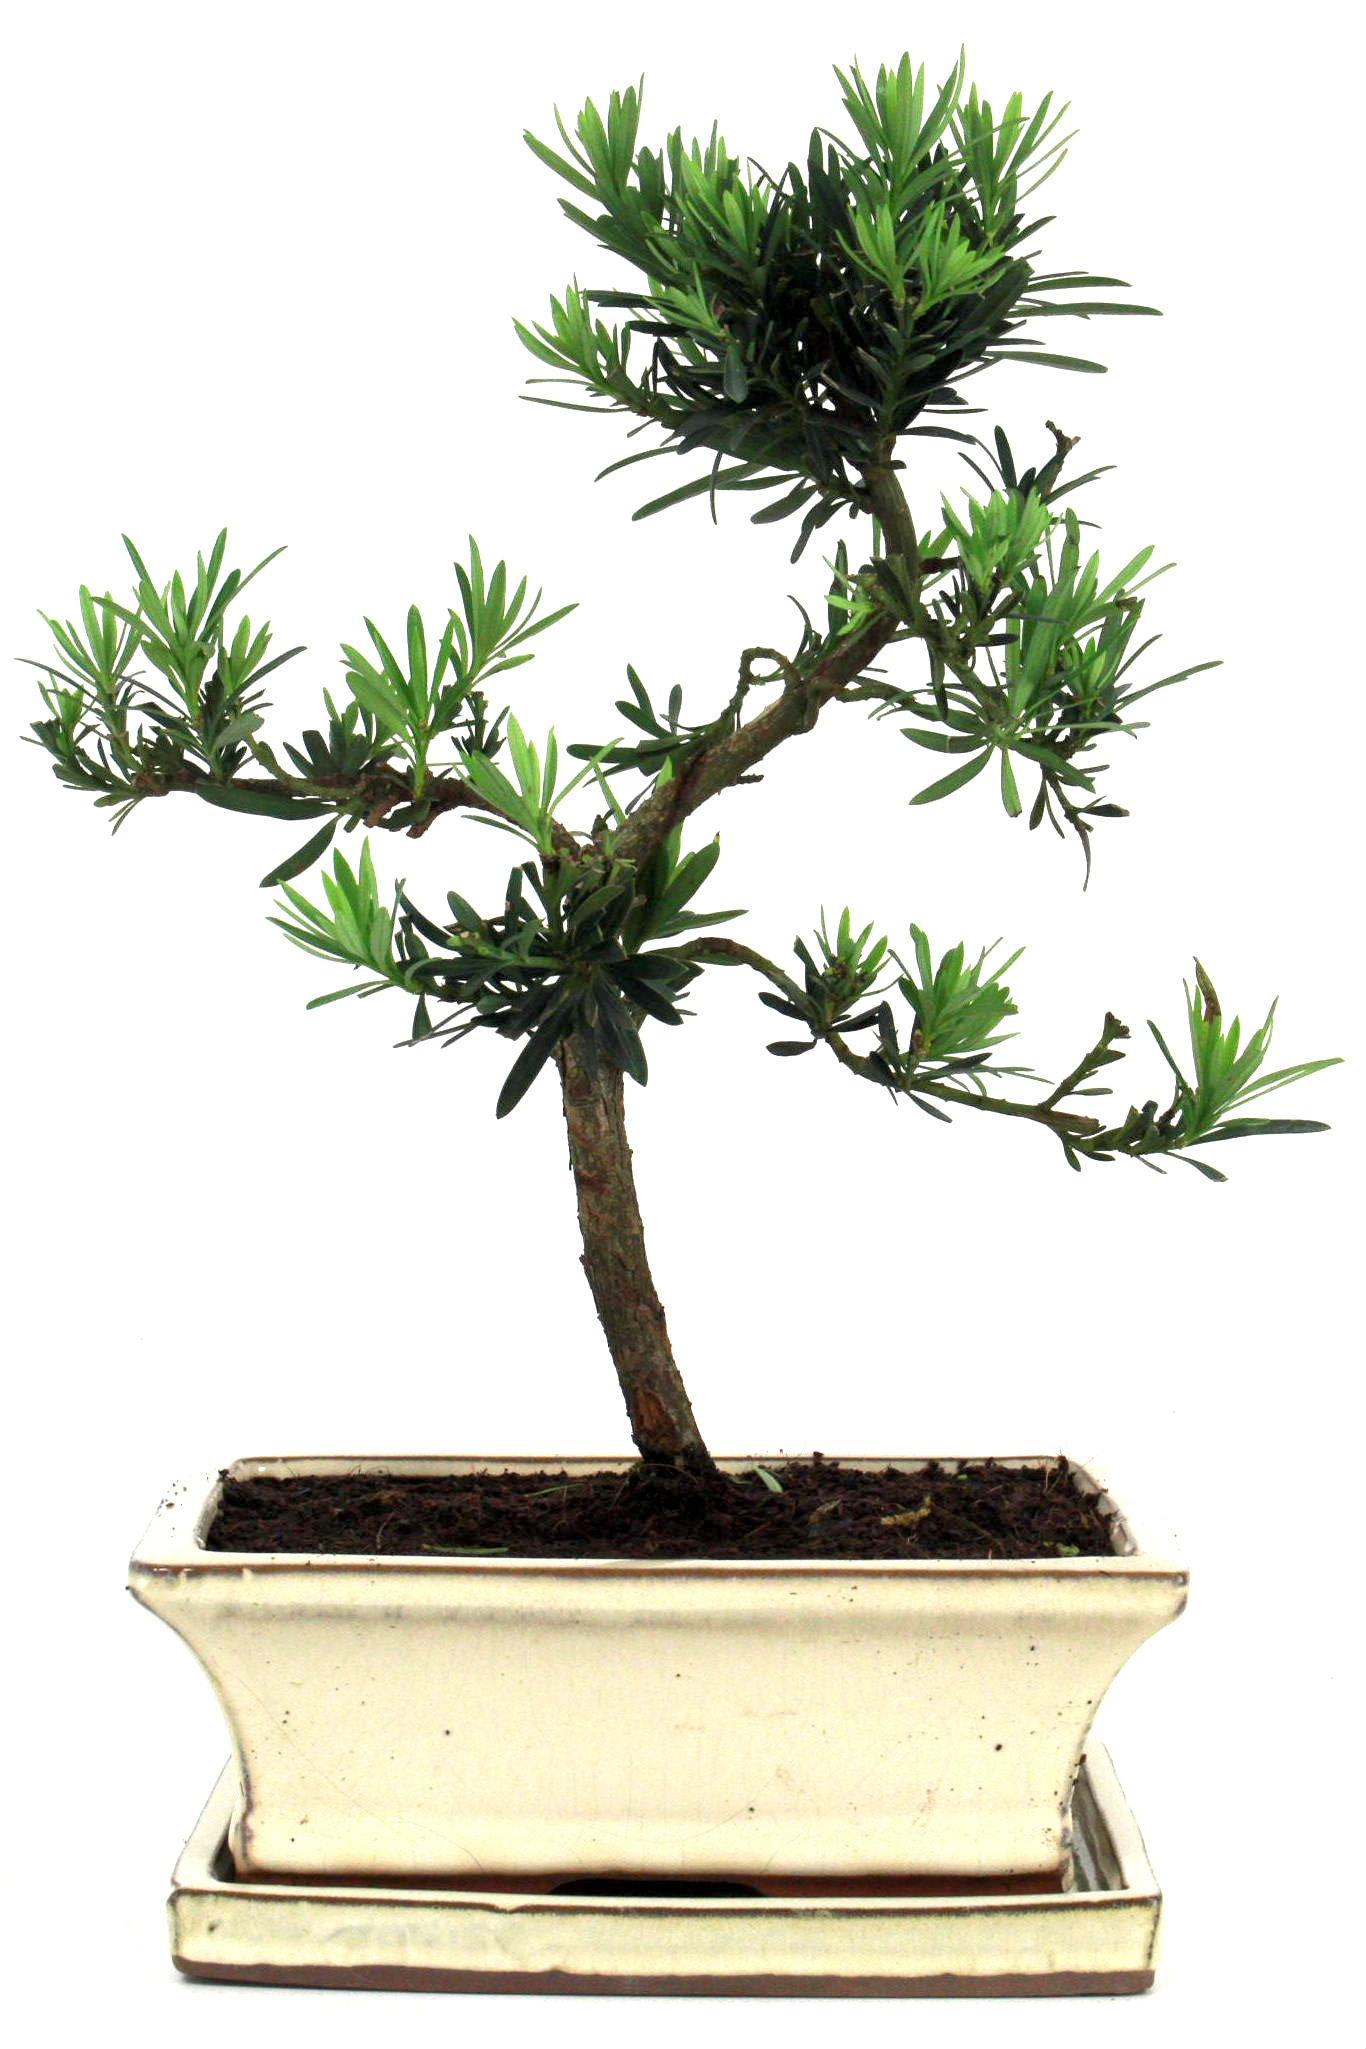 steineibe bonsai 35 40 cm 1926 bei oyaki bonsai kaufen. Black Bedroom Furniture Sets. Home Design Ideas